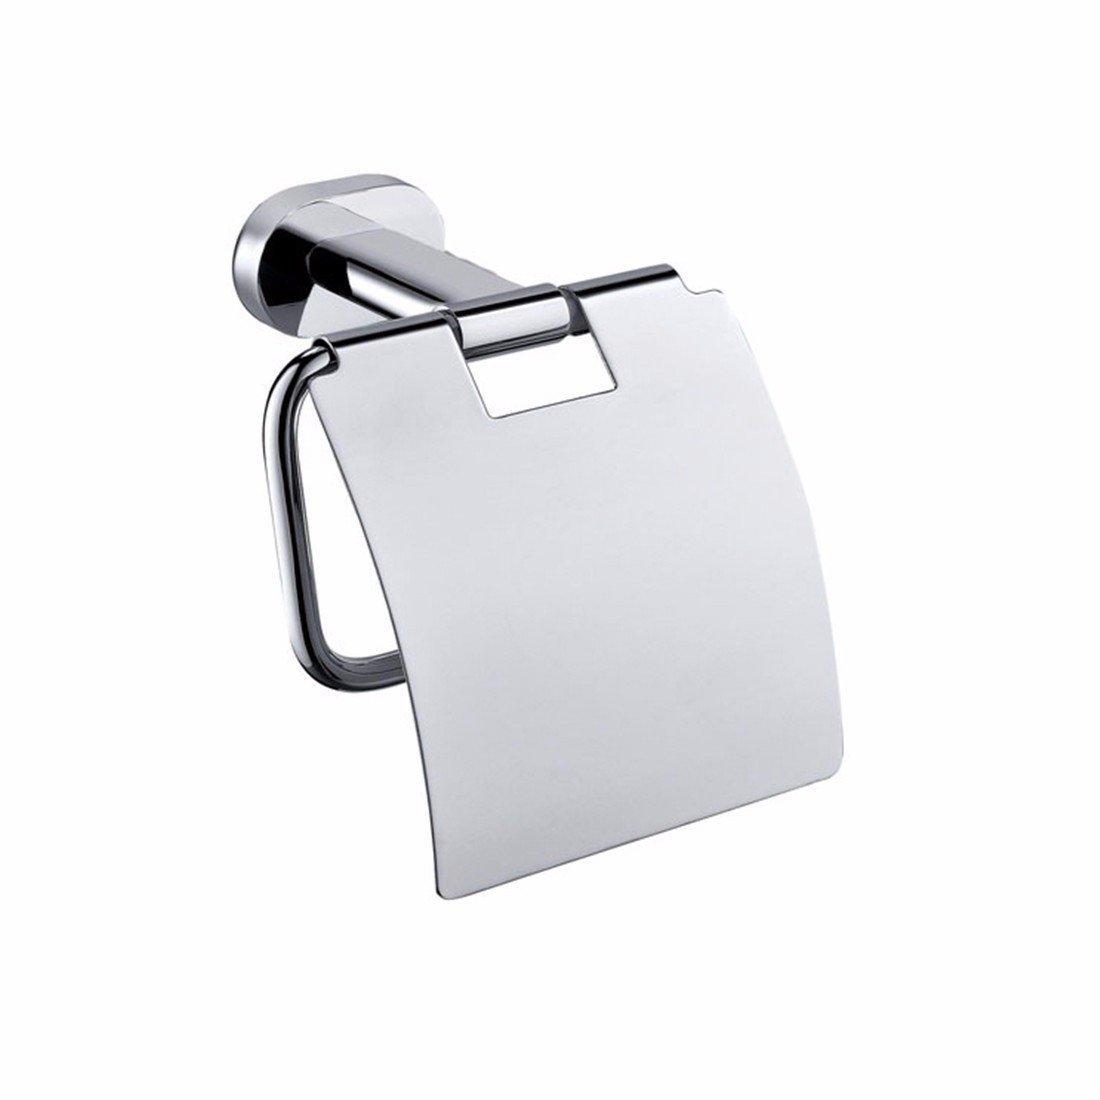 LAONA Contemporary chrome plated oval base copper stainless steel bathroom pendant, towel bar, toilet brush rack,Toilet paper holder